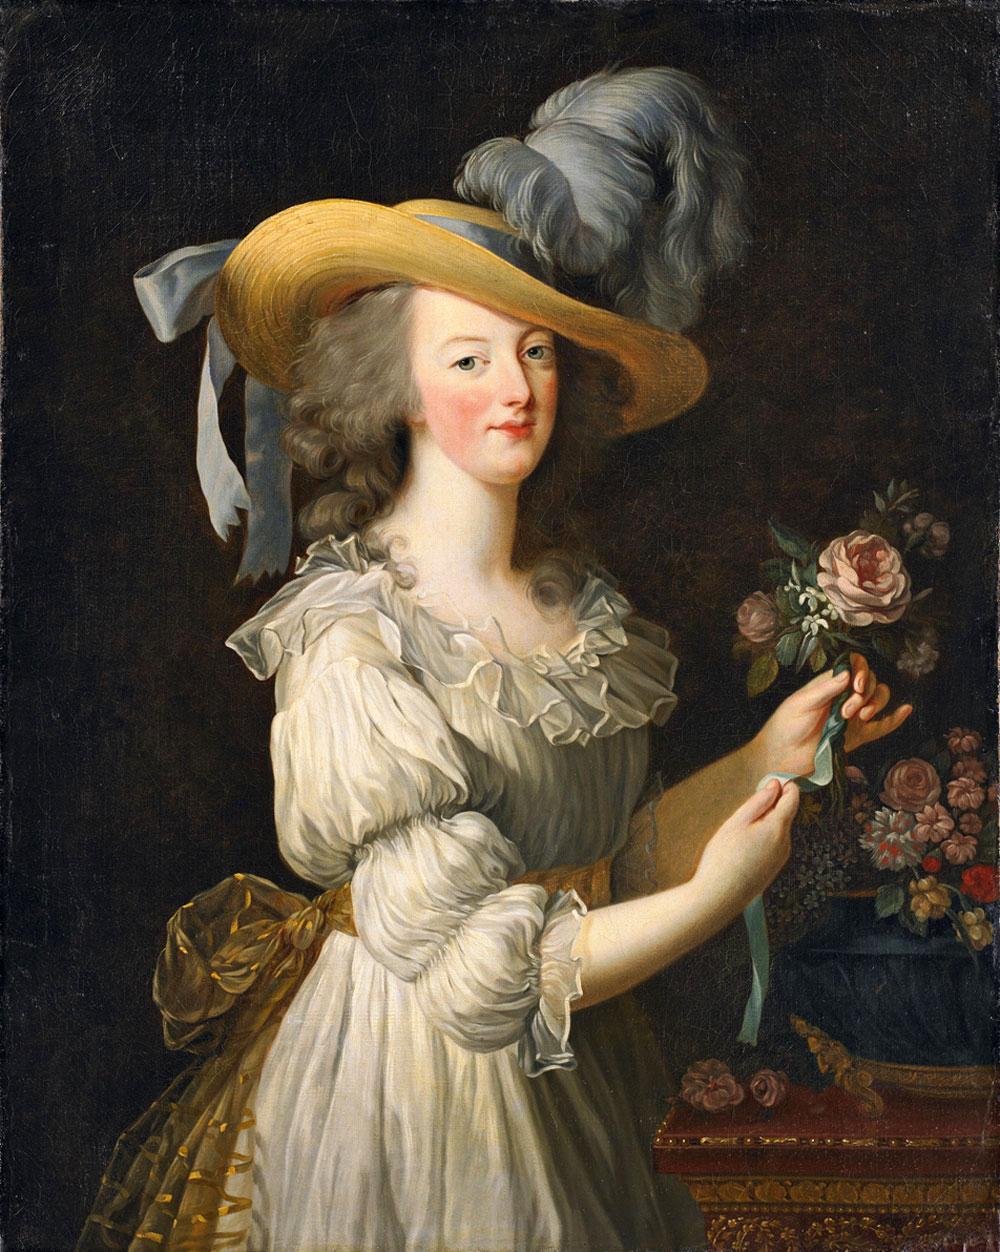 Elisabeth Vigée Lebrun, Marie Antoinette in a Muslin Dress, 1793, oil on canvas, Schloss Wolfsgarten